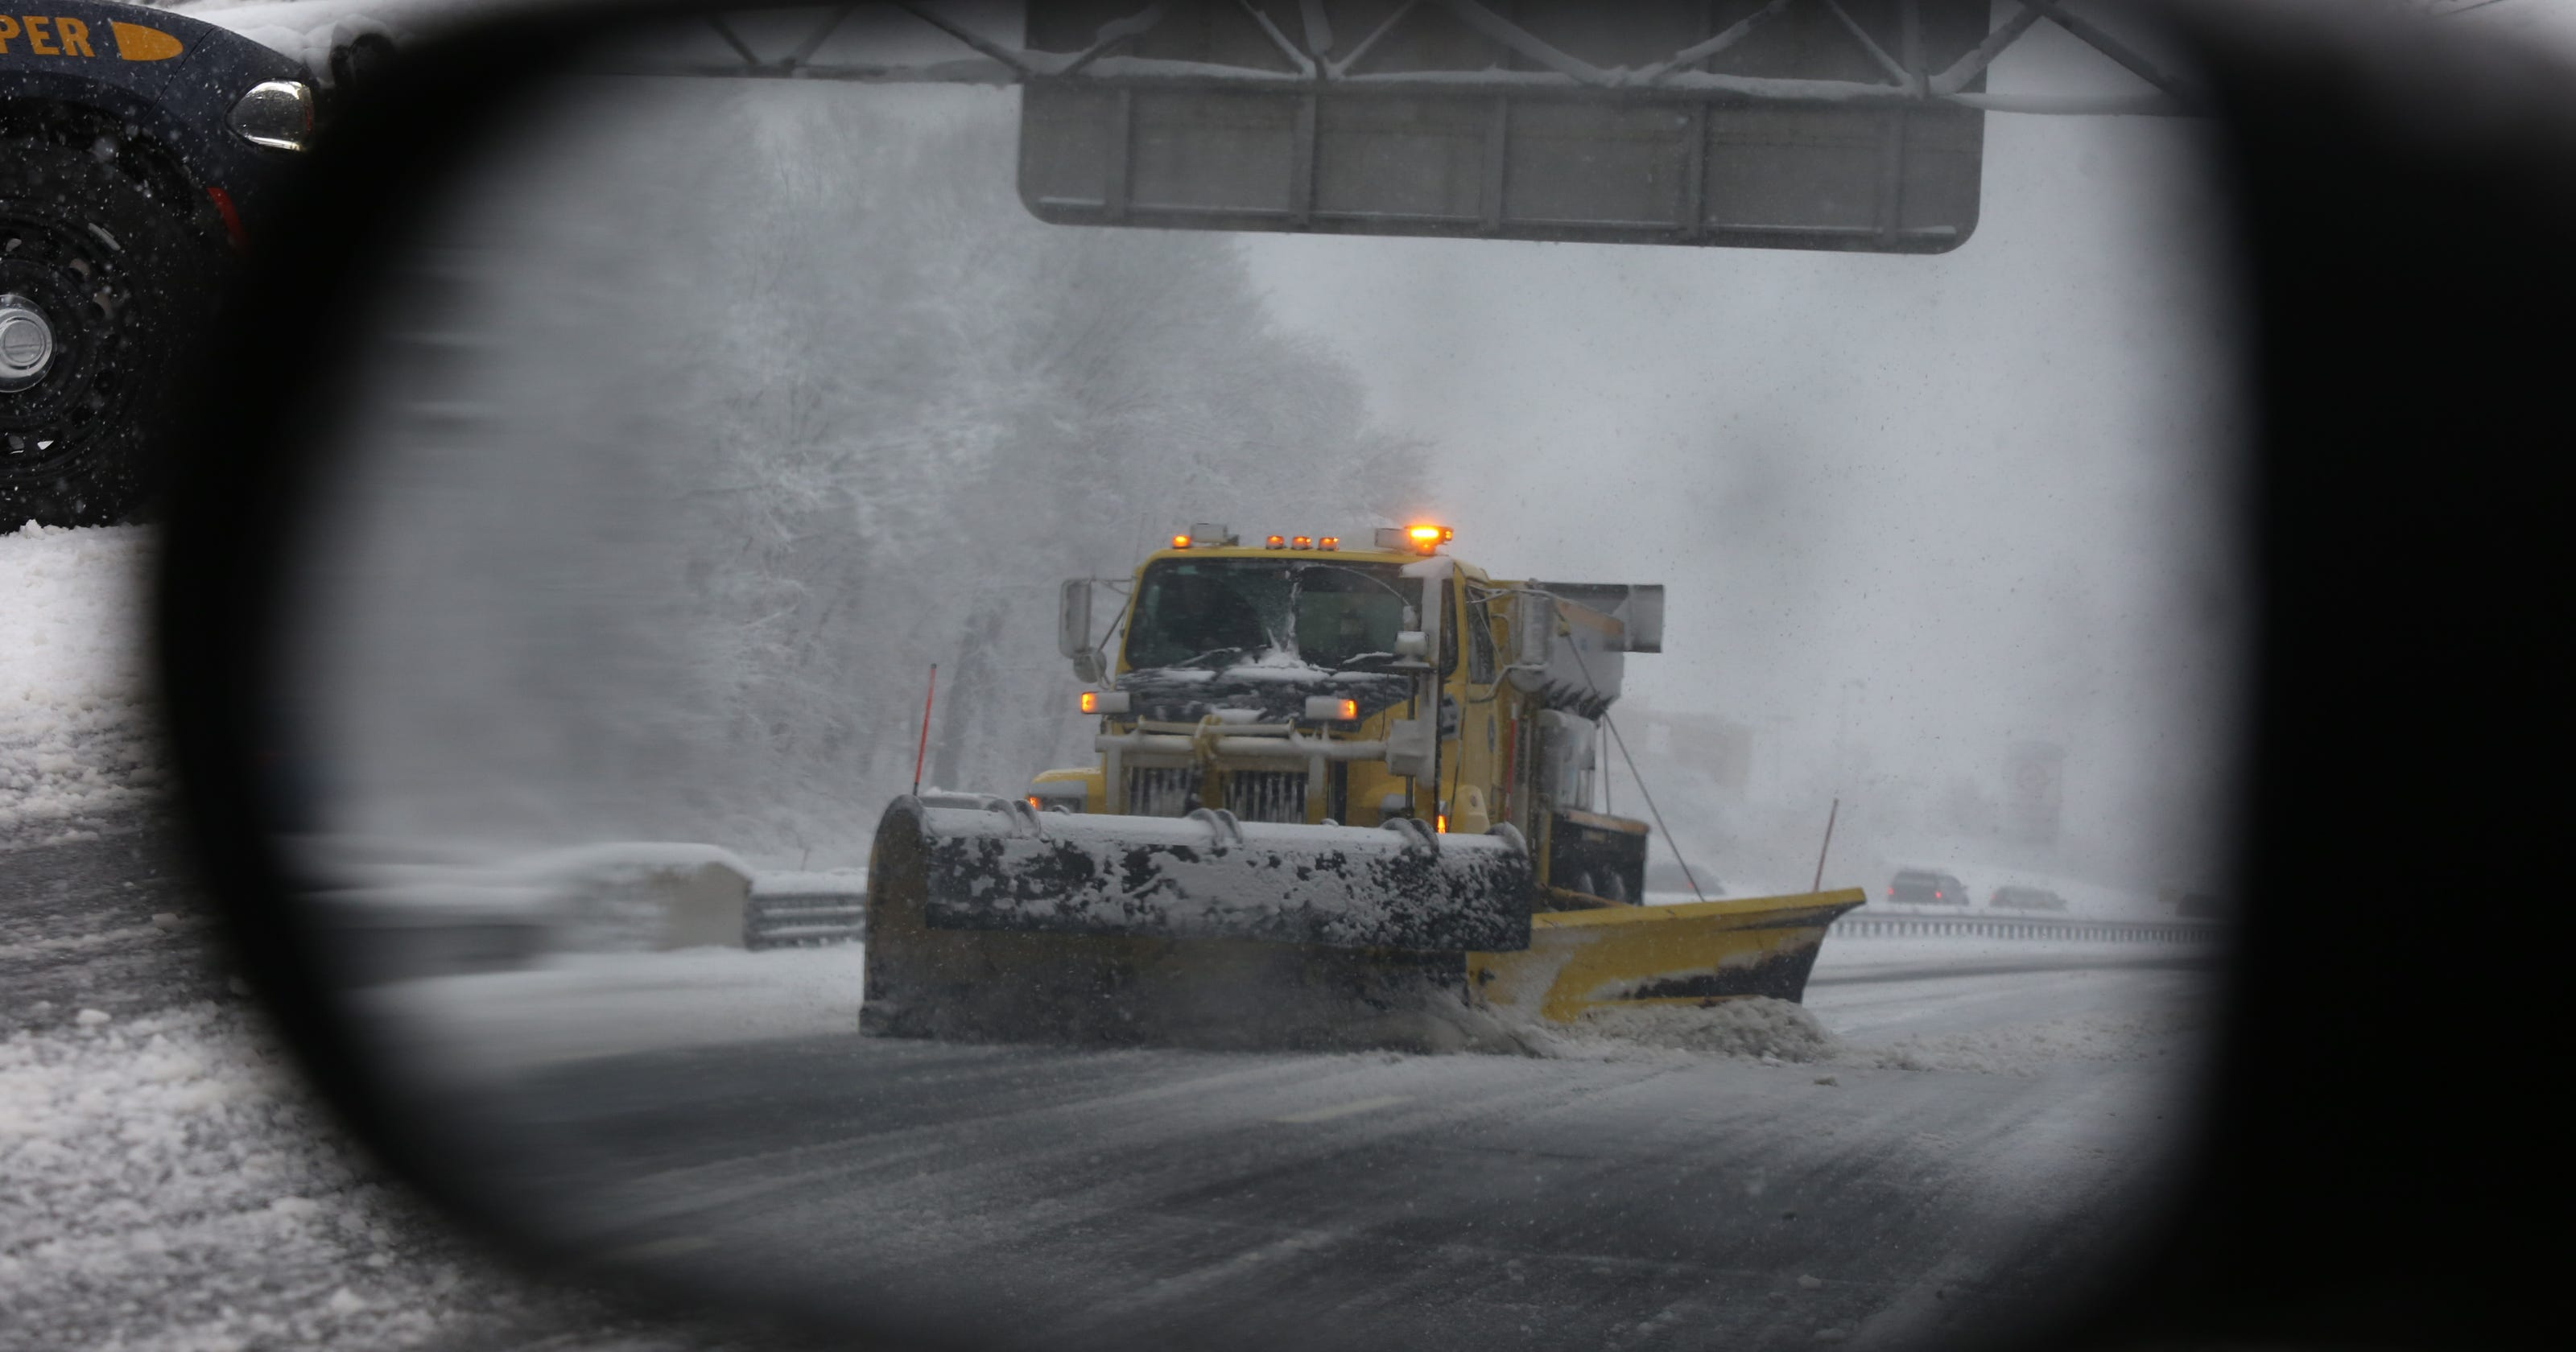 Farmers' Almanac predicts cold winter, plenty of snow